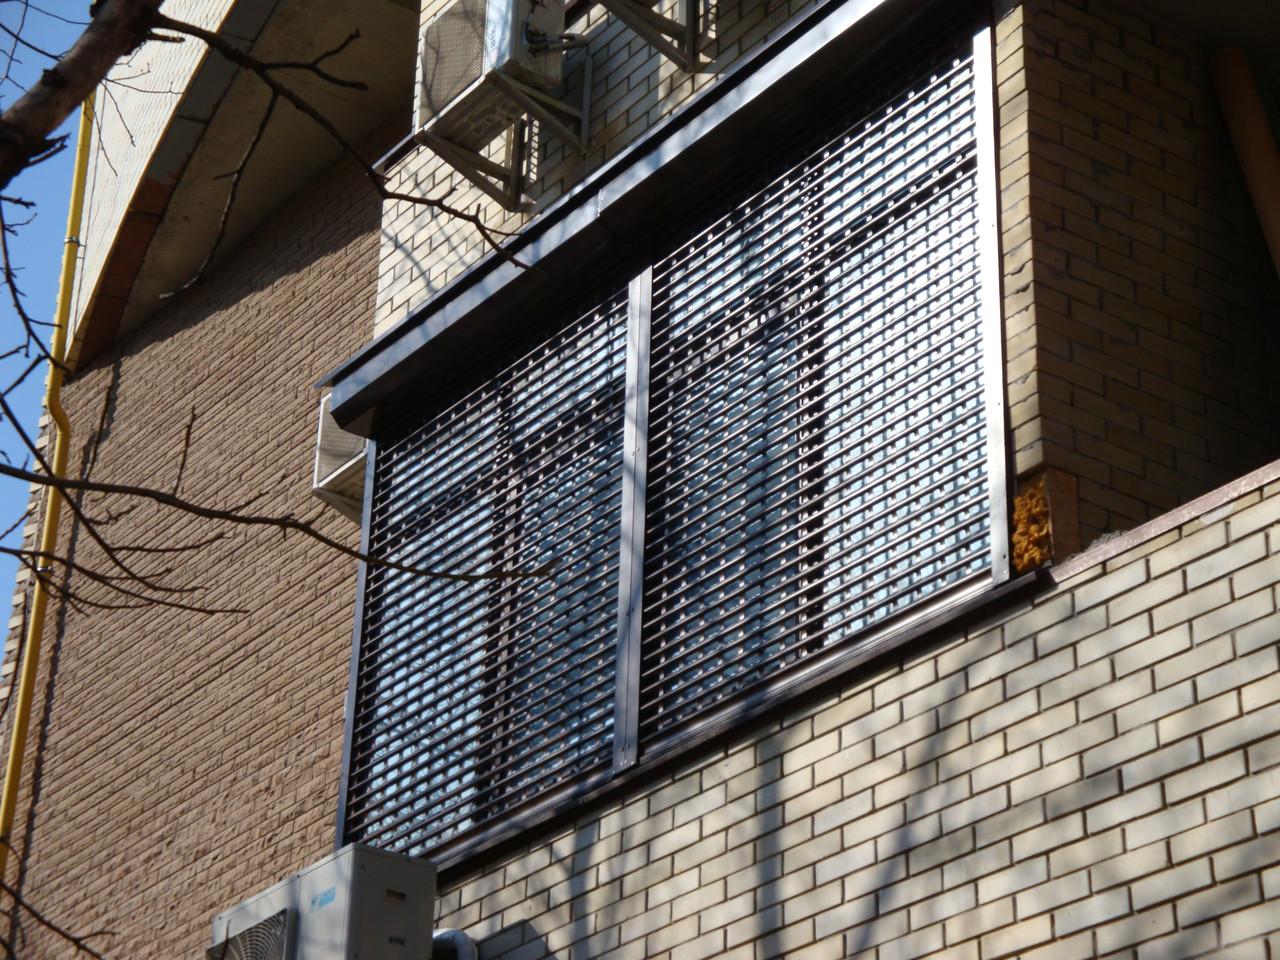 Ролеты решетки: продажа, цена в днепре. решетки на окна и дв.